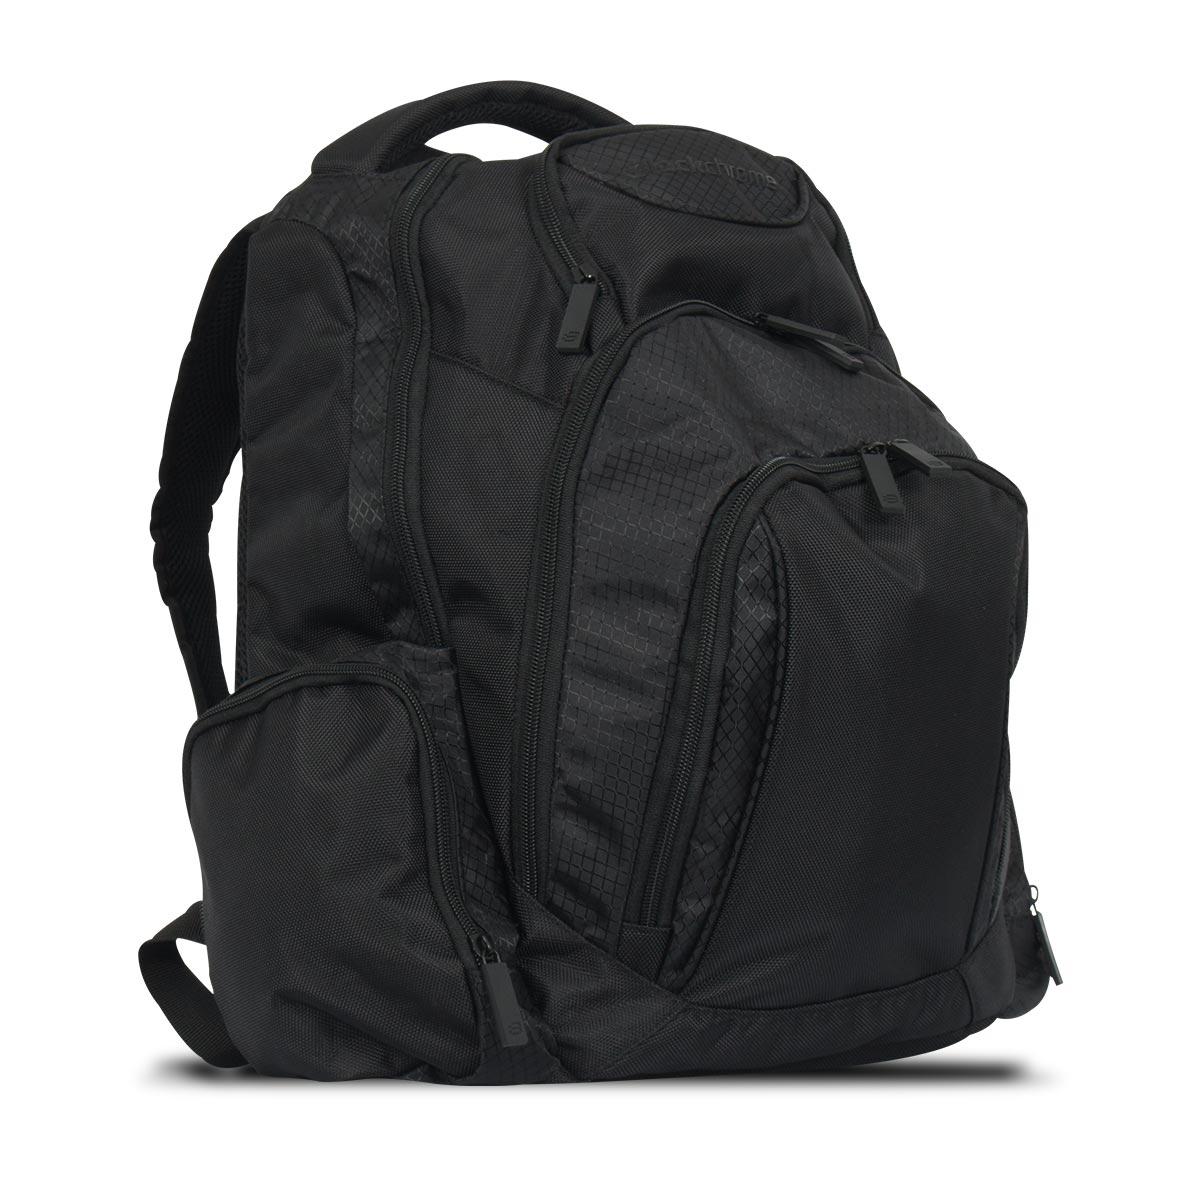 The Elite Backpack #1